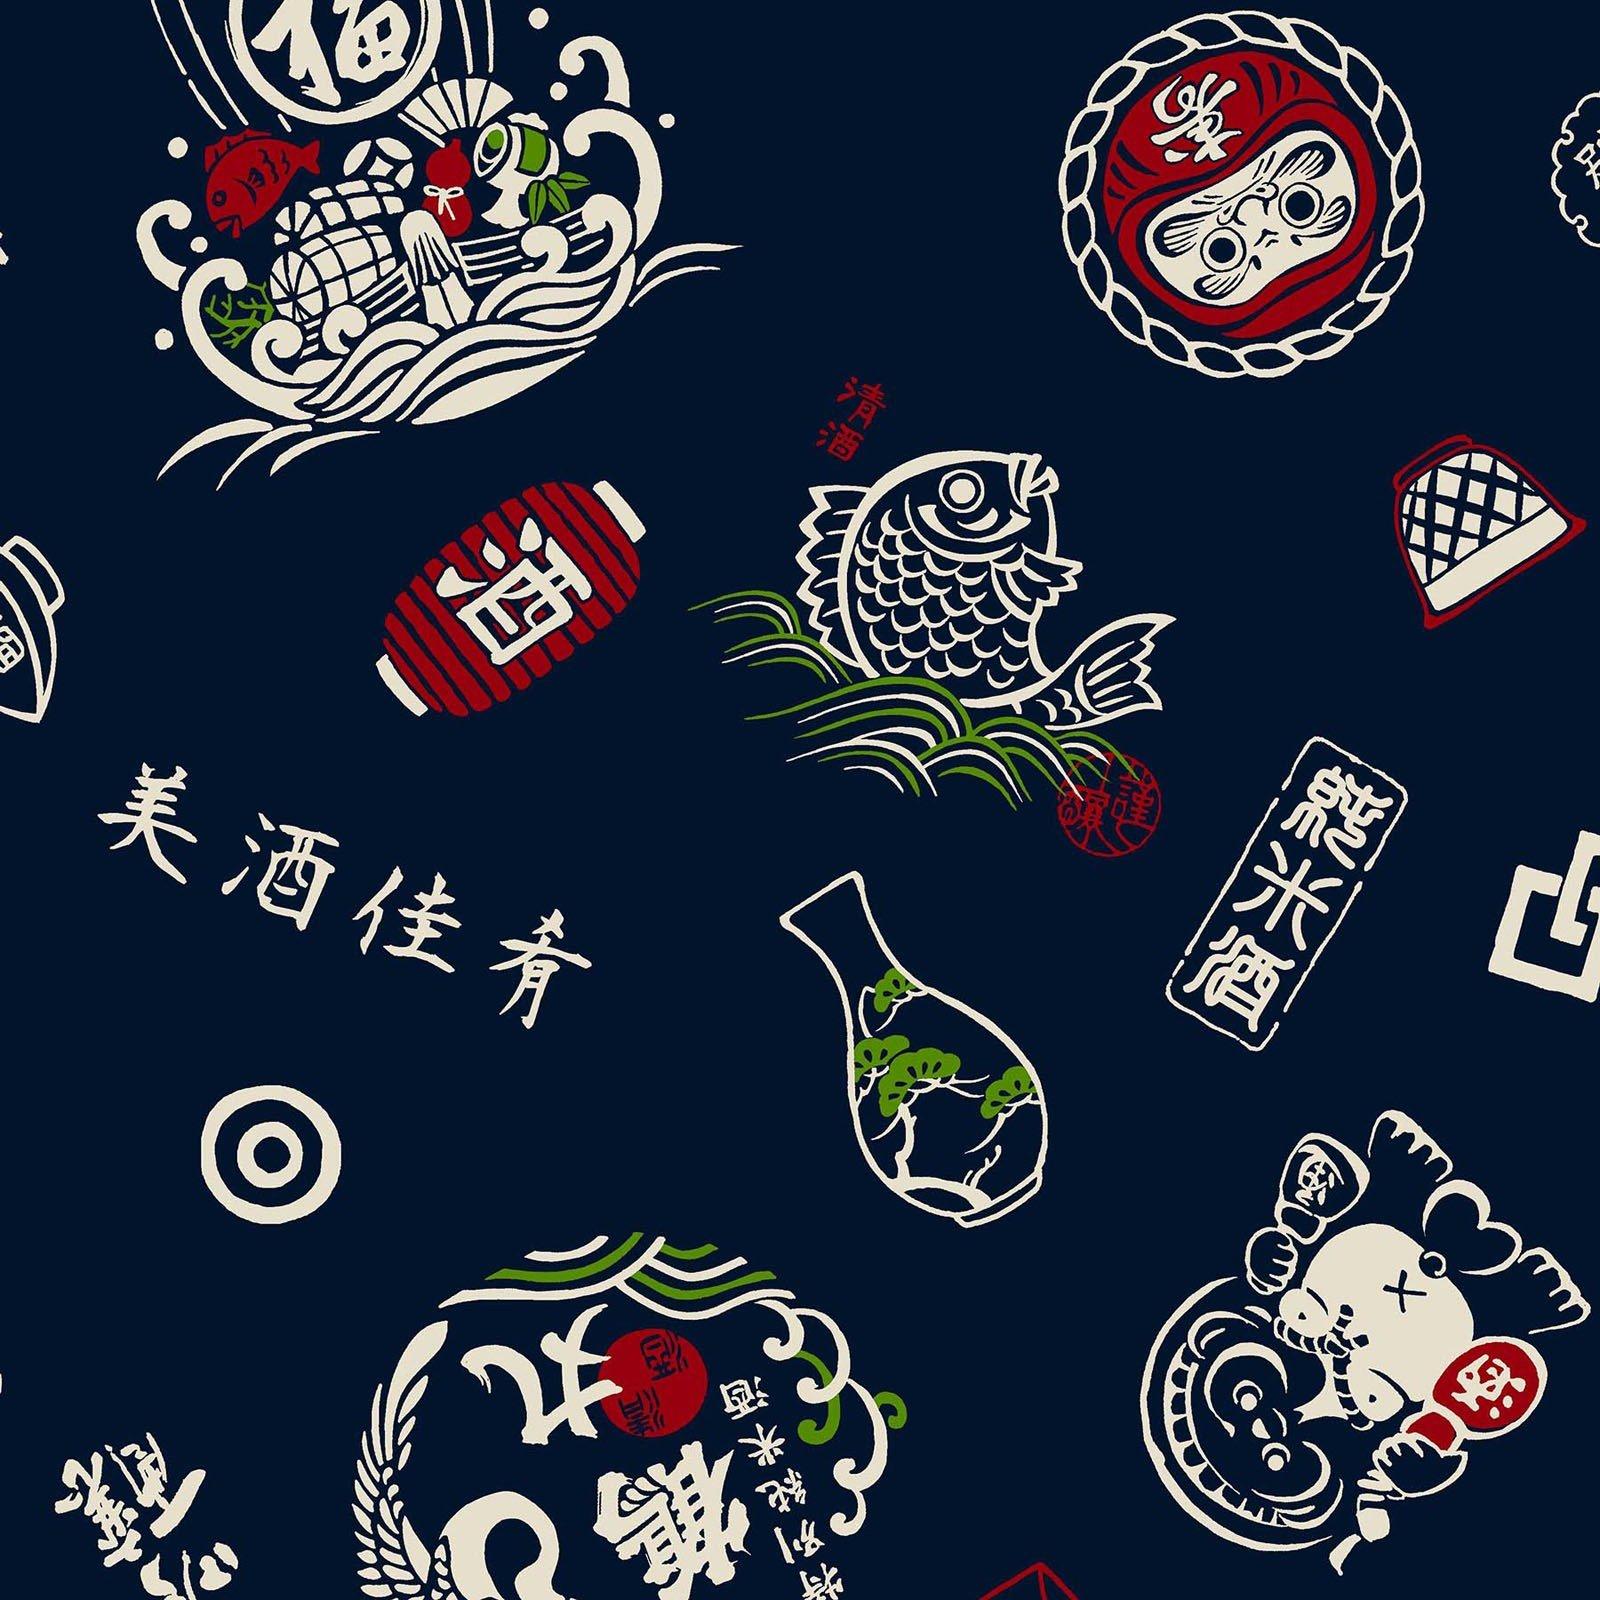 Retro Japanese Style - Sushi Bar Motifs - Navy